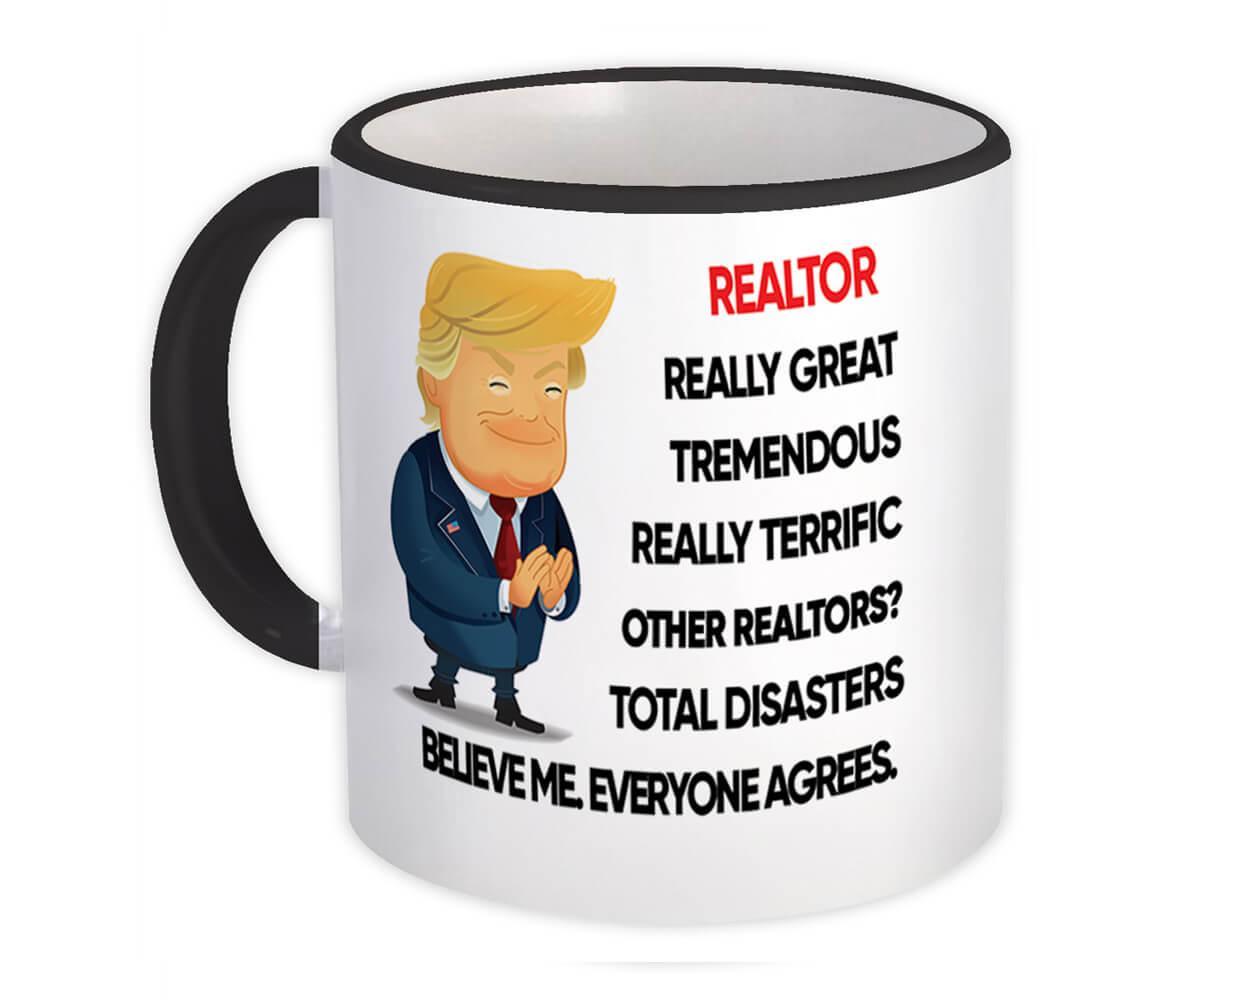 REALTOR Fun Trump : Gift Mug Terrific Christmas Humor Coworker Office Birthday